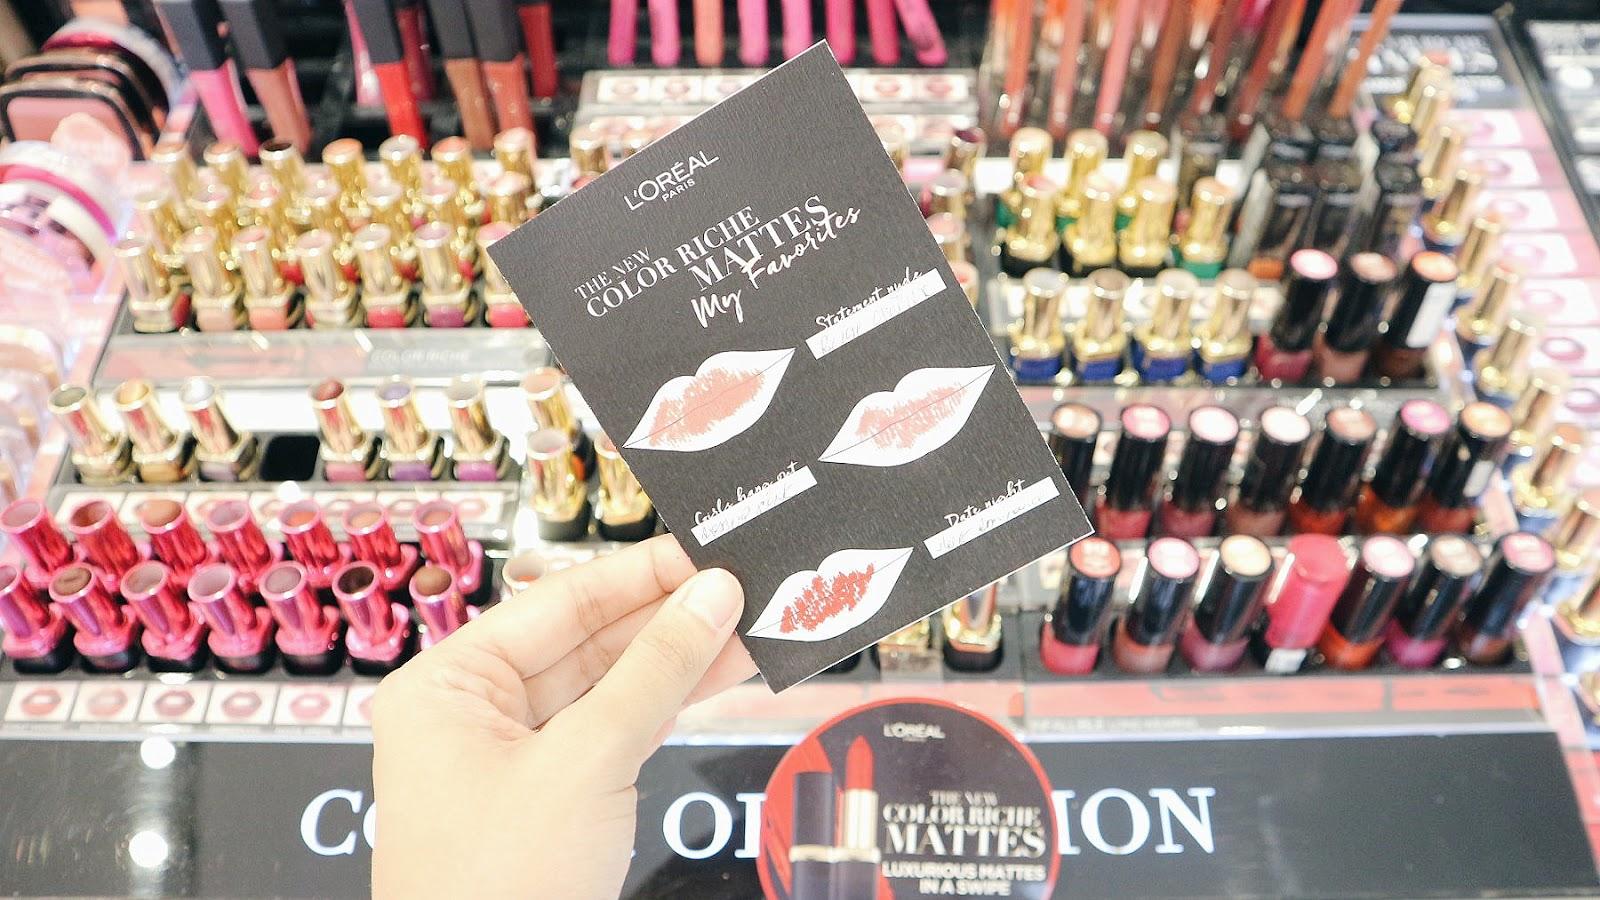 SM Beauty Playground Where to buy makeup in Manila? SM Makati